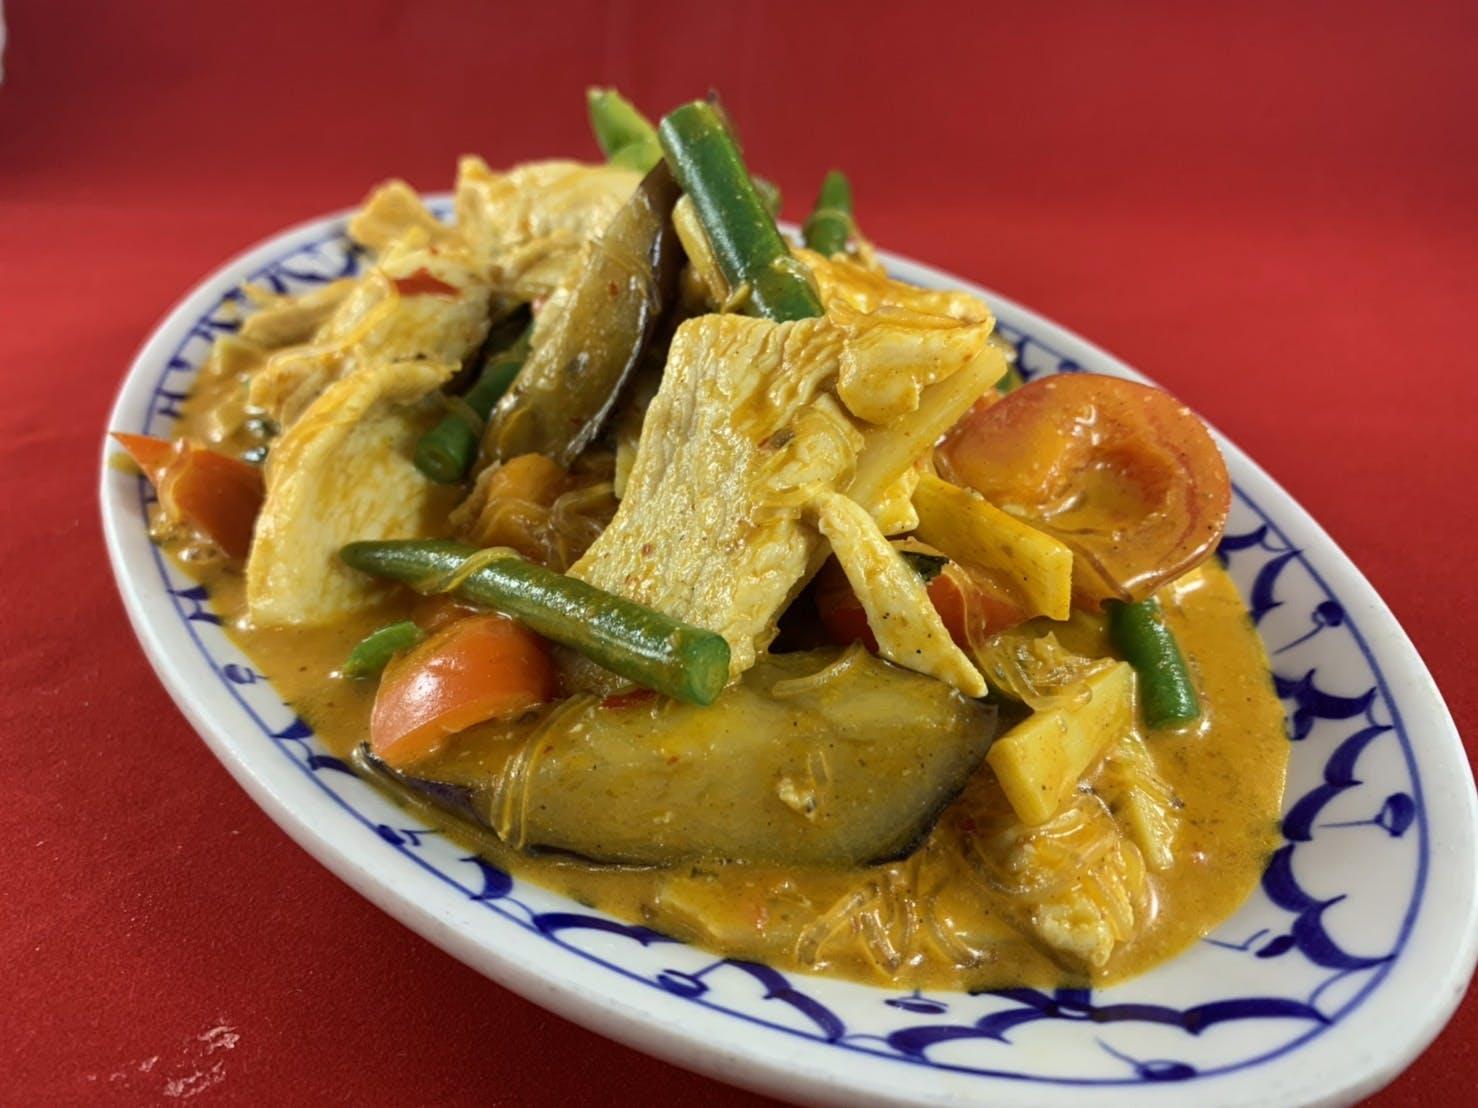 55. Gaeng Hoak (Dinner) from Sa-Bai Thong - University Ave in Madison, WI